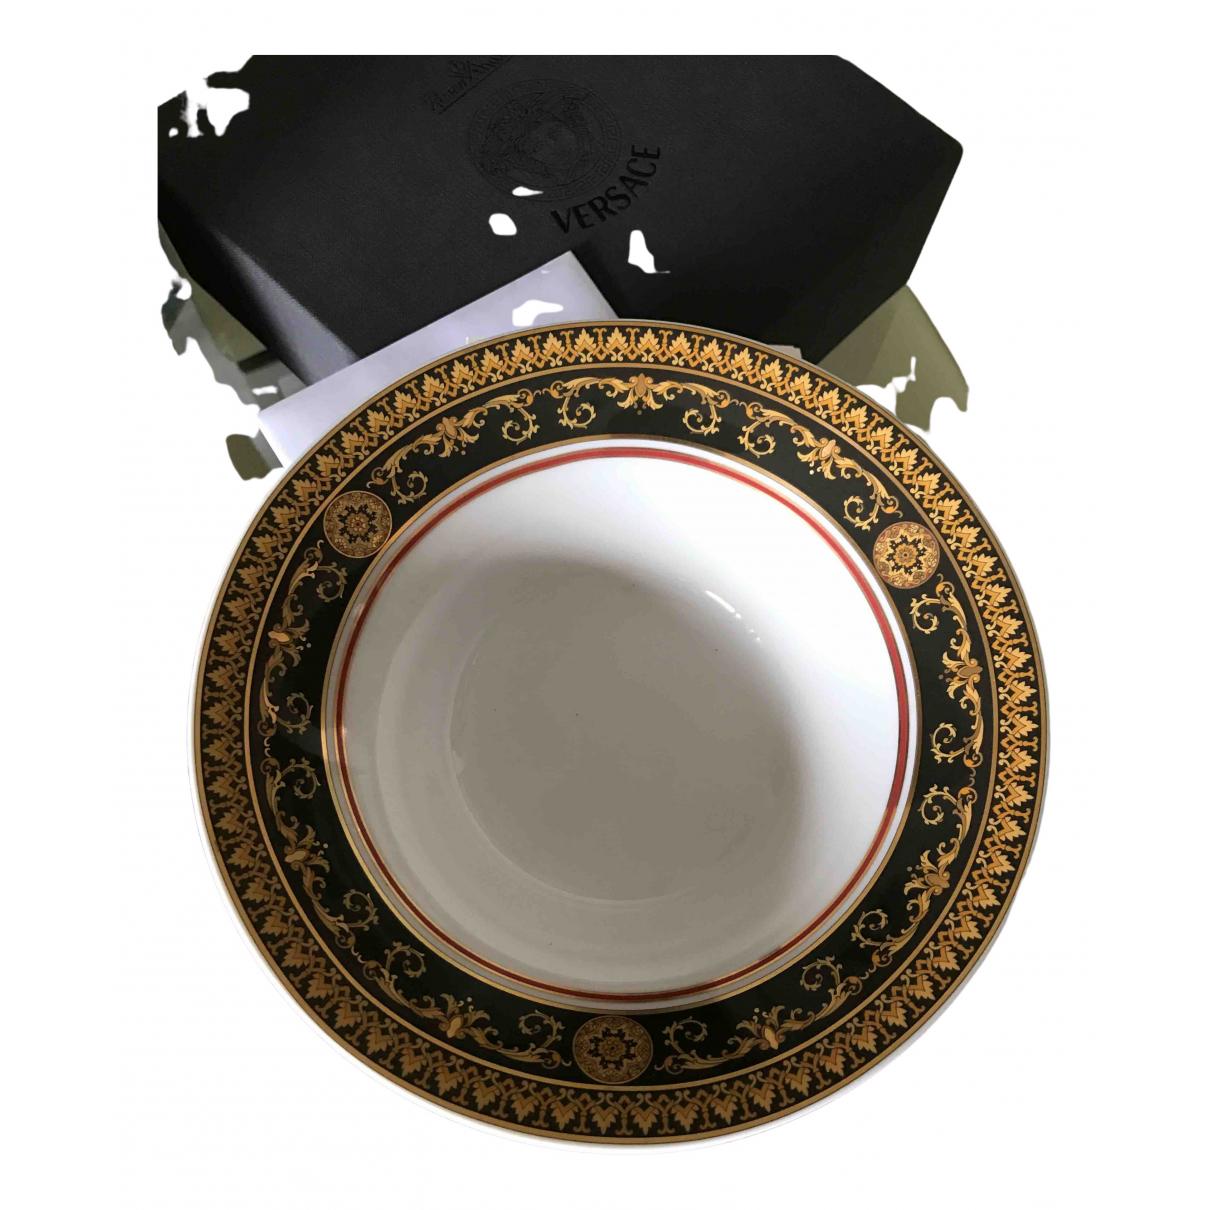 Objeto de decoracion de Porcelana Versace